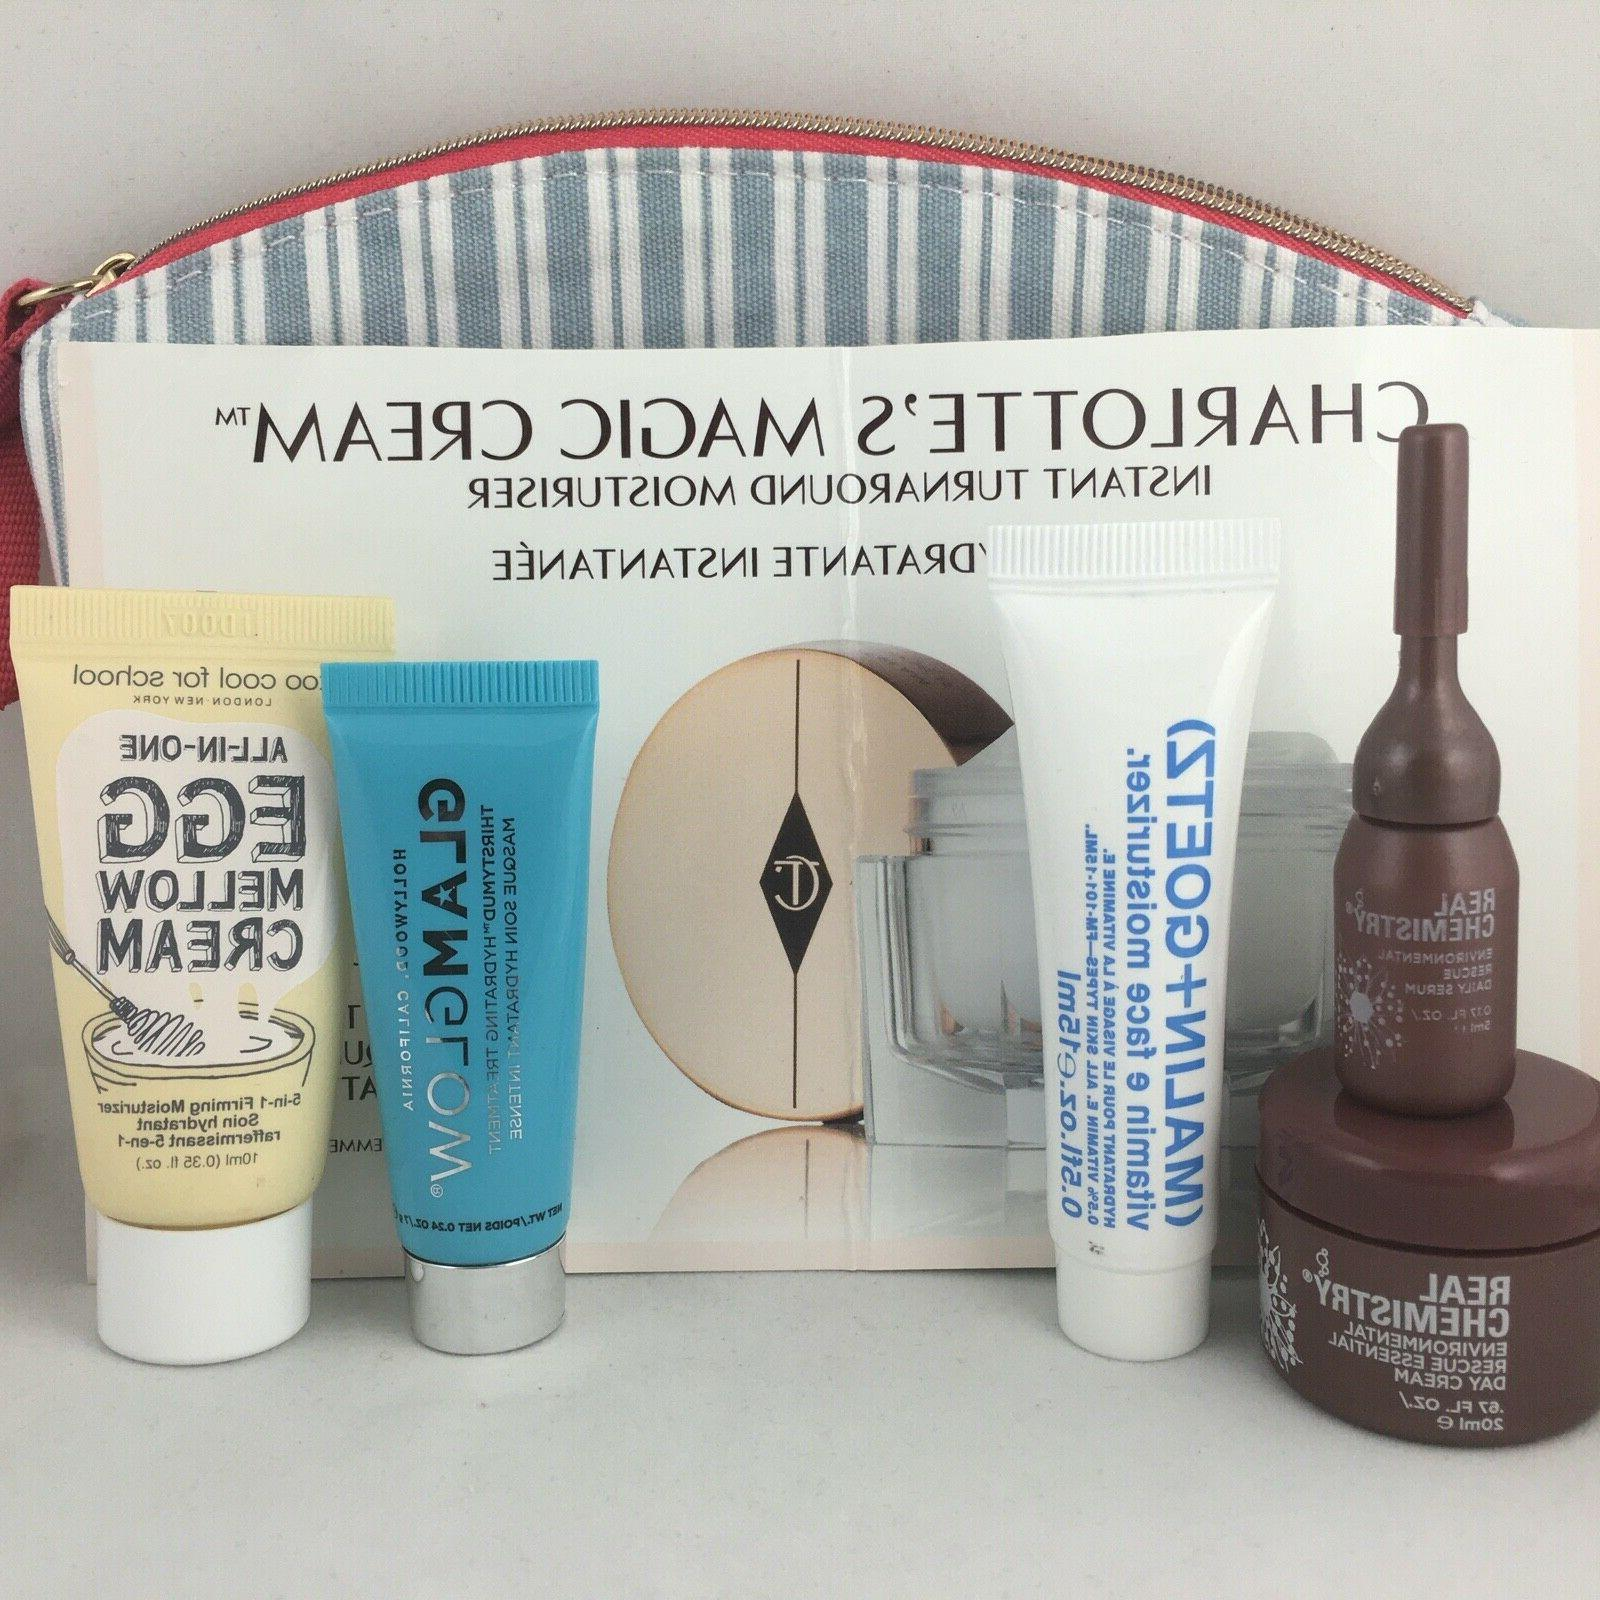 cosmetic facial skin lot moisturizer cream serum